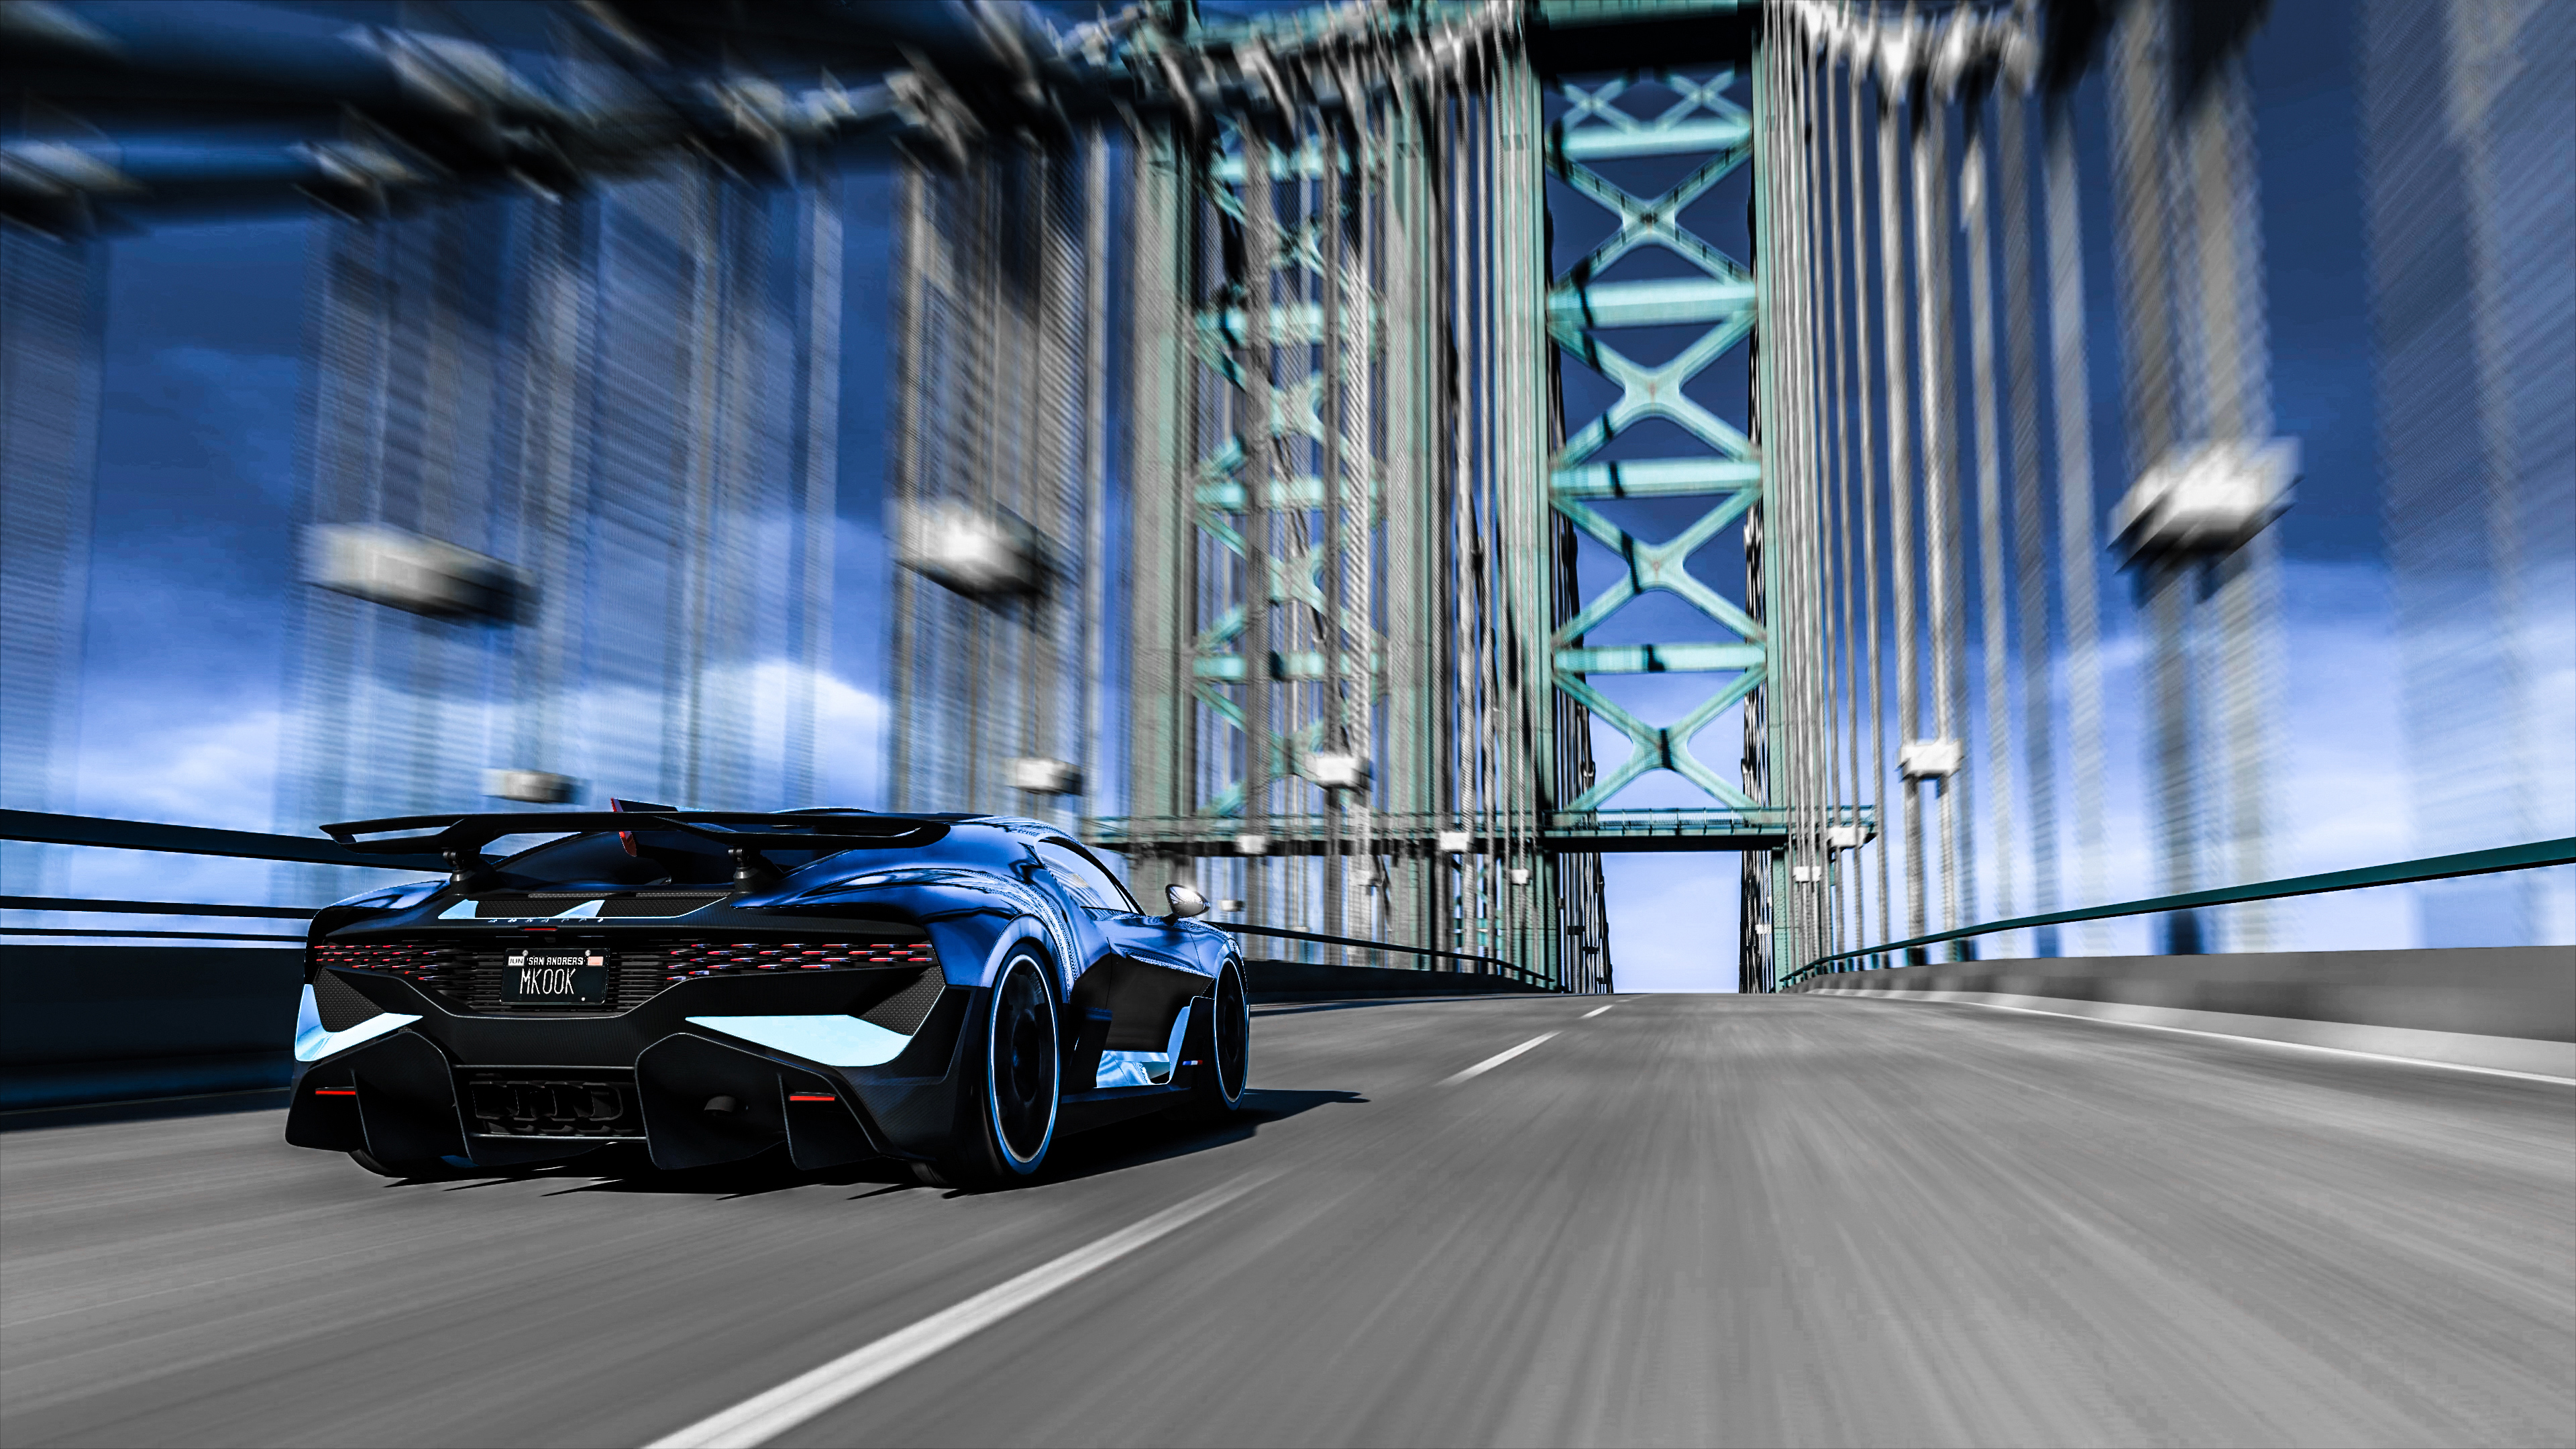 2048x1152 Gta V Redux Nature 2048x1152 Resolution Hd 4k: 3840x2160 Gta V Bugatti Divo On Highway 4k HD 4k